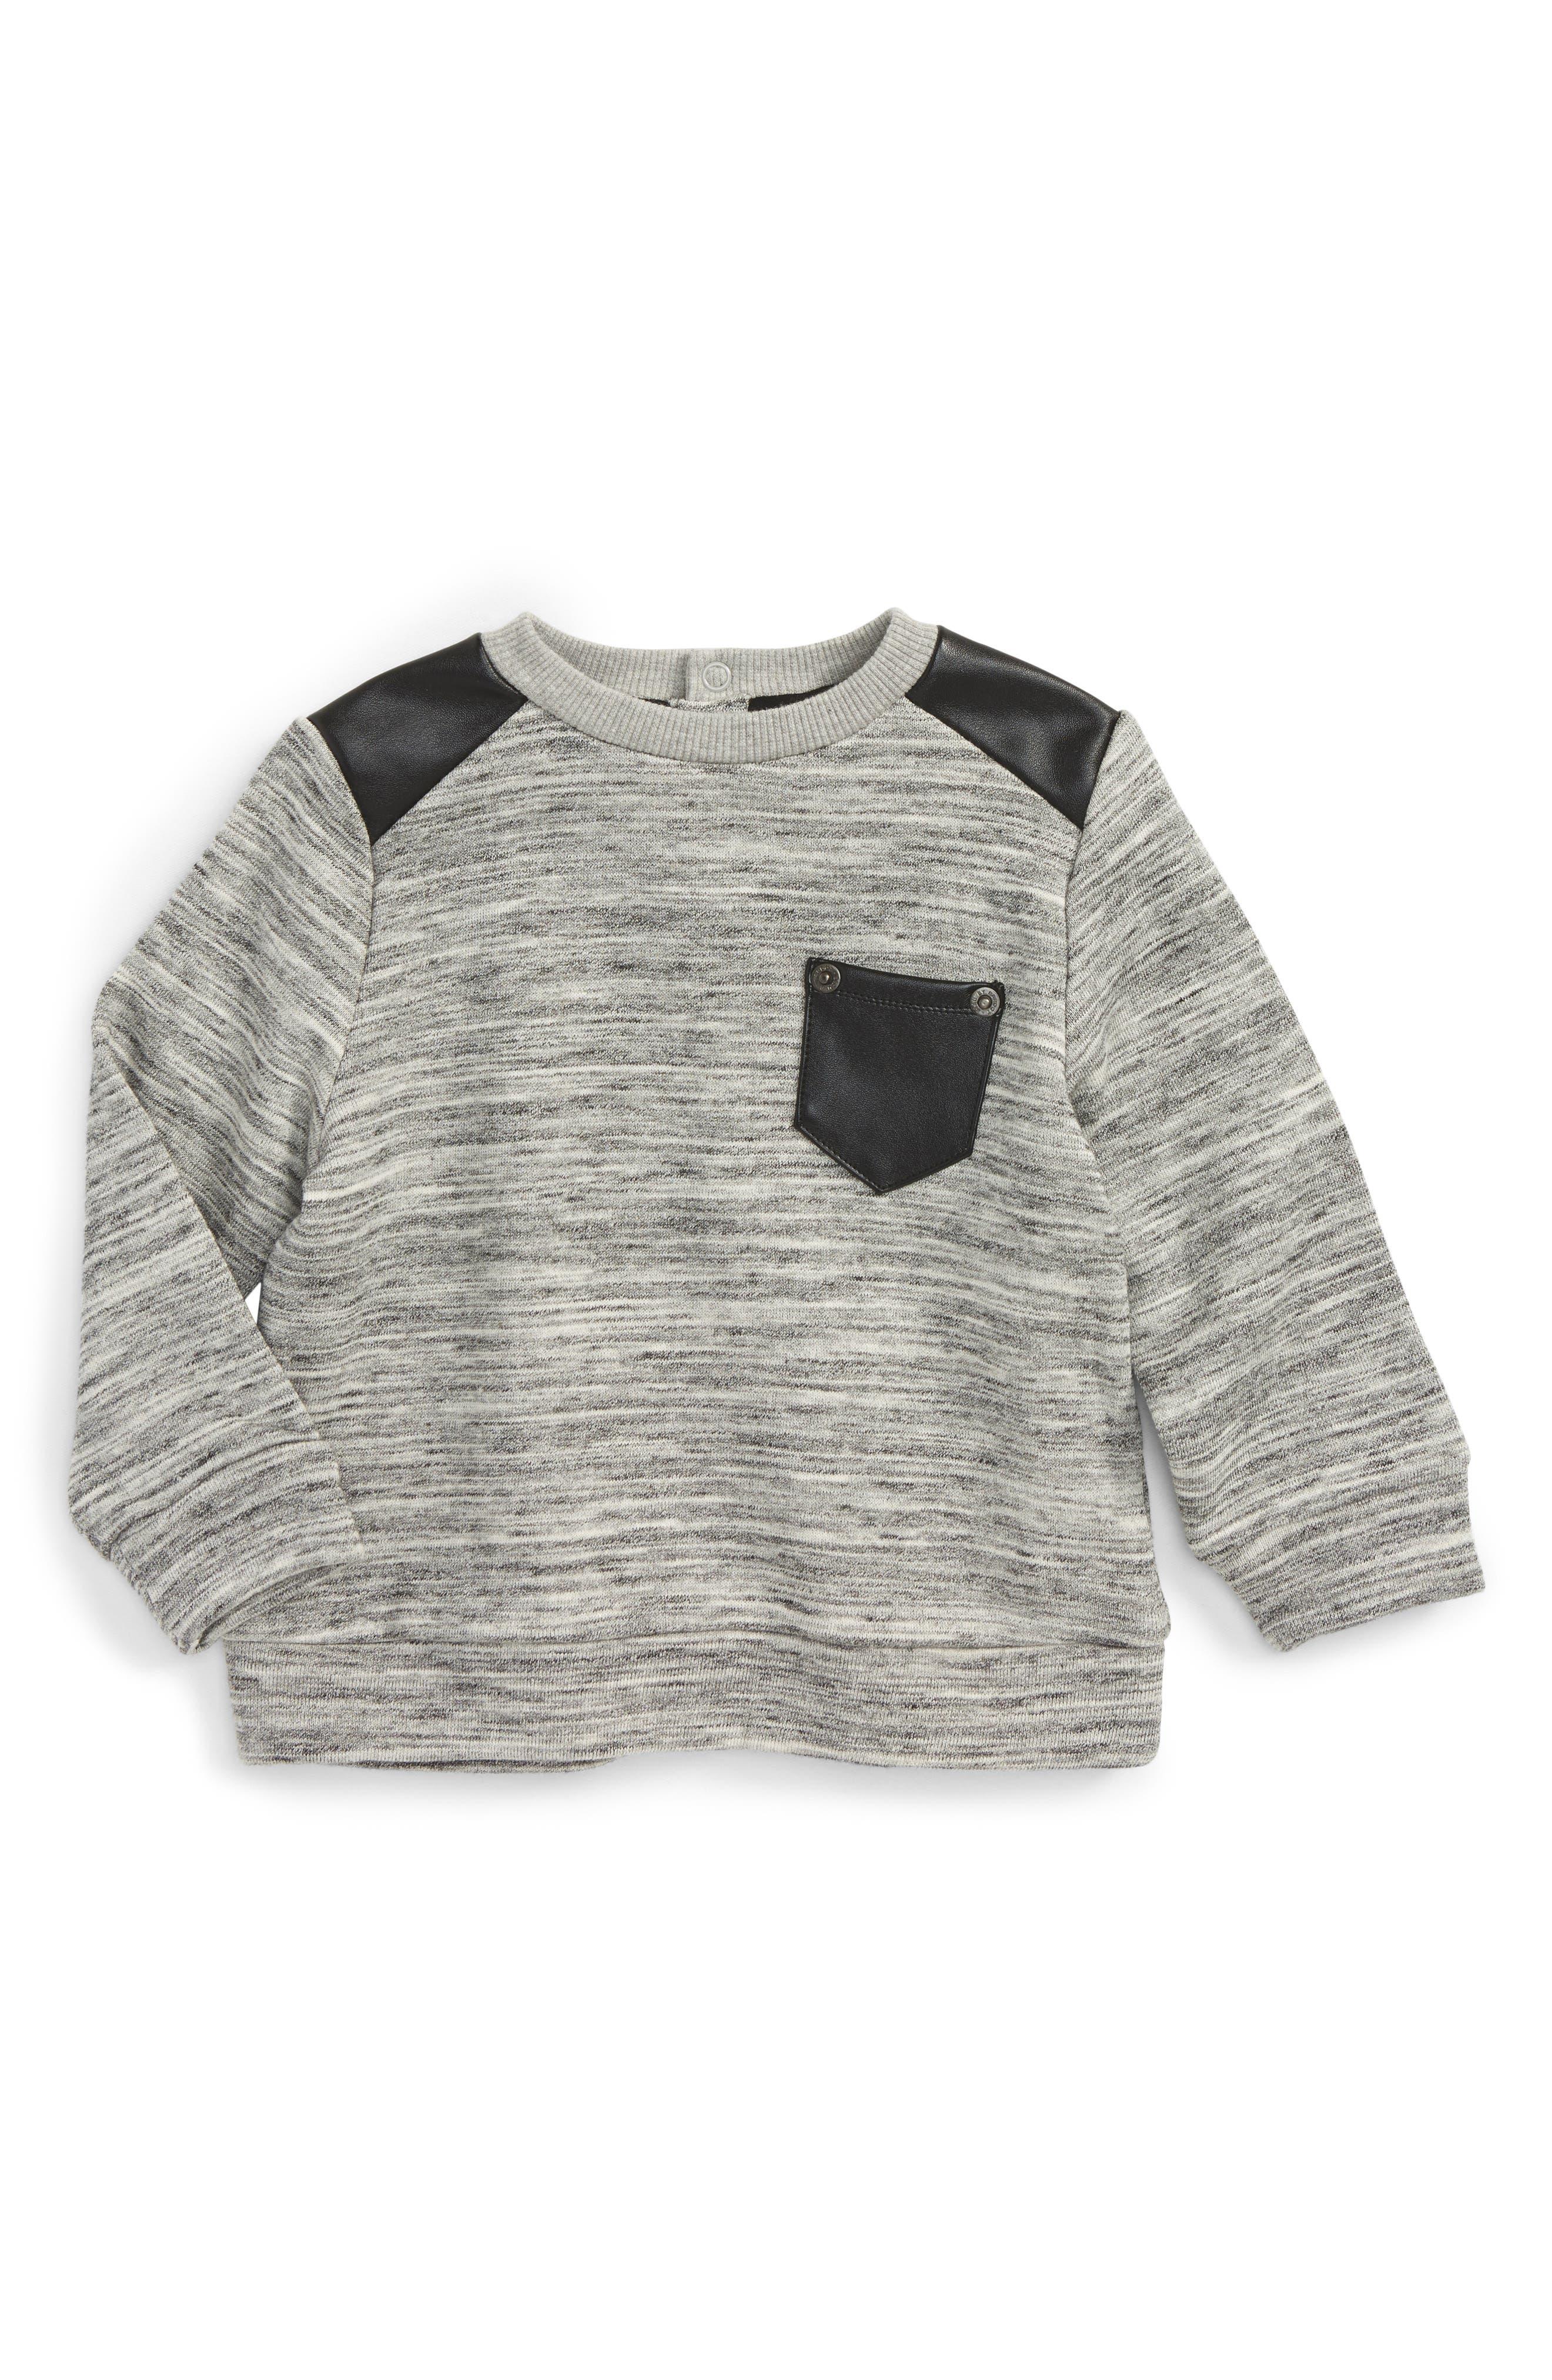 Moto Sweater,                             Main thumbnail 1, color,